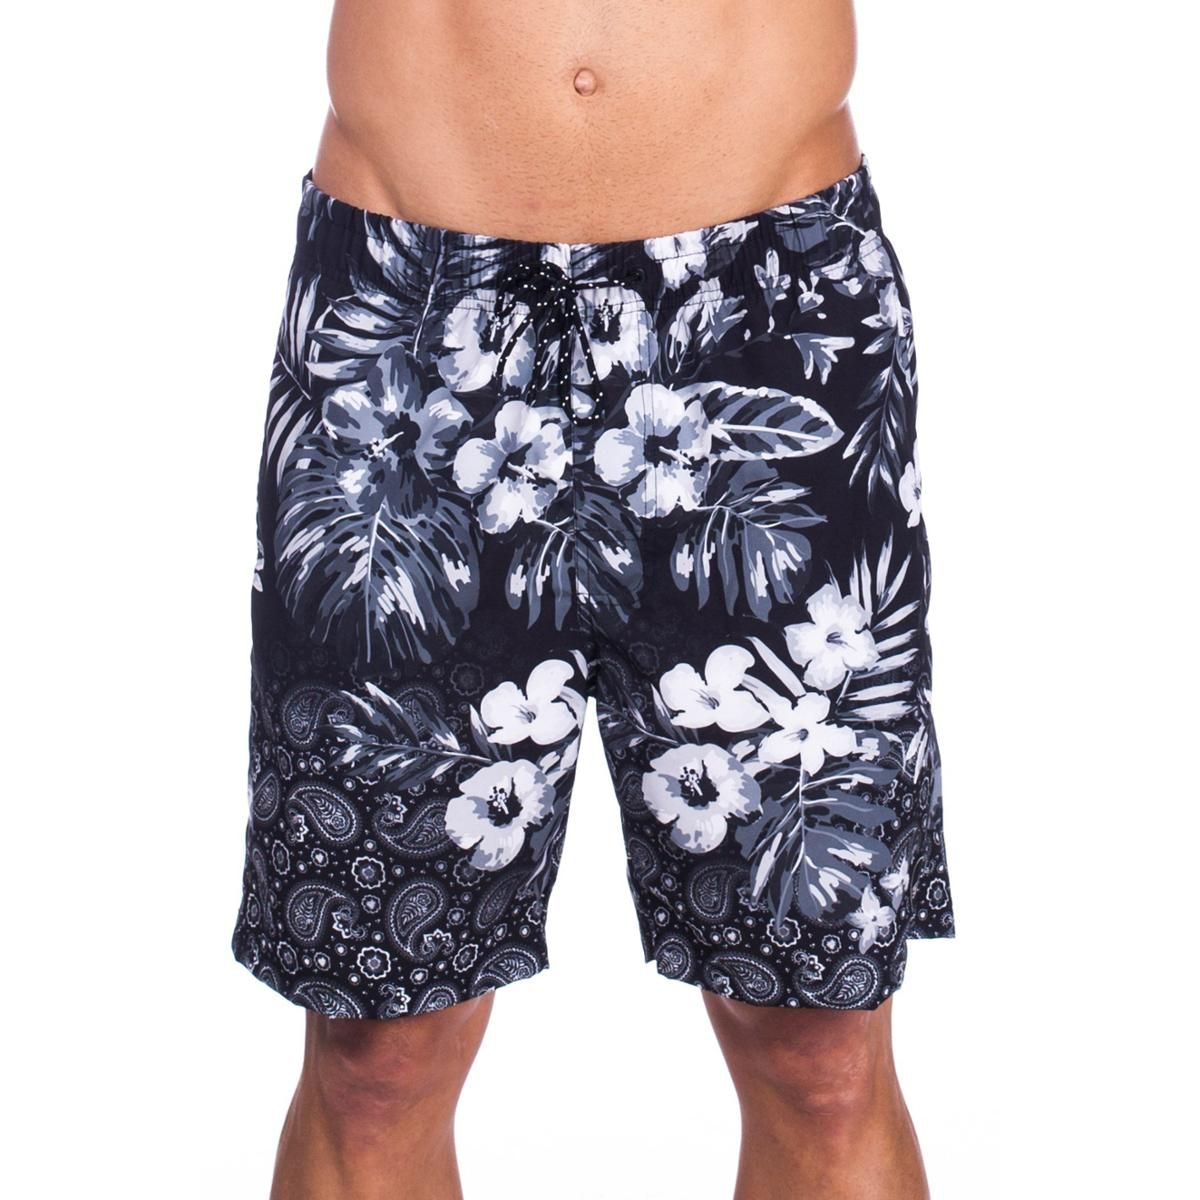 KIT 50 Short Bermuda Moletom Masculina Florida Floral Atacado